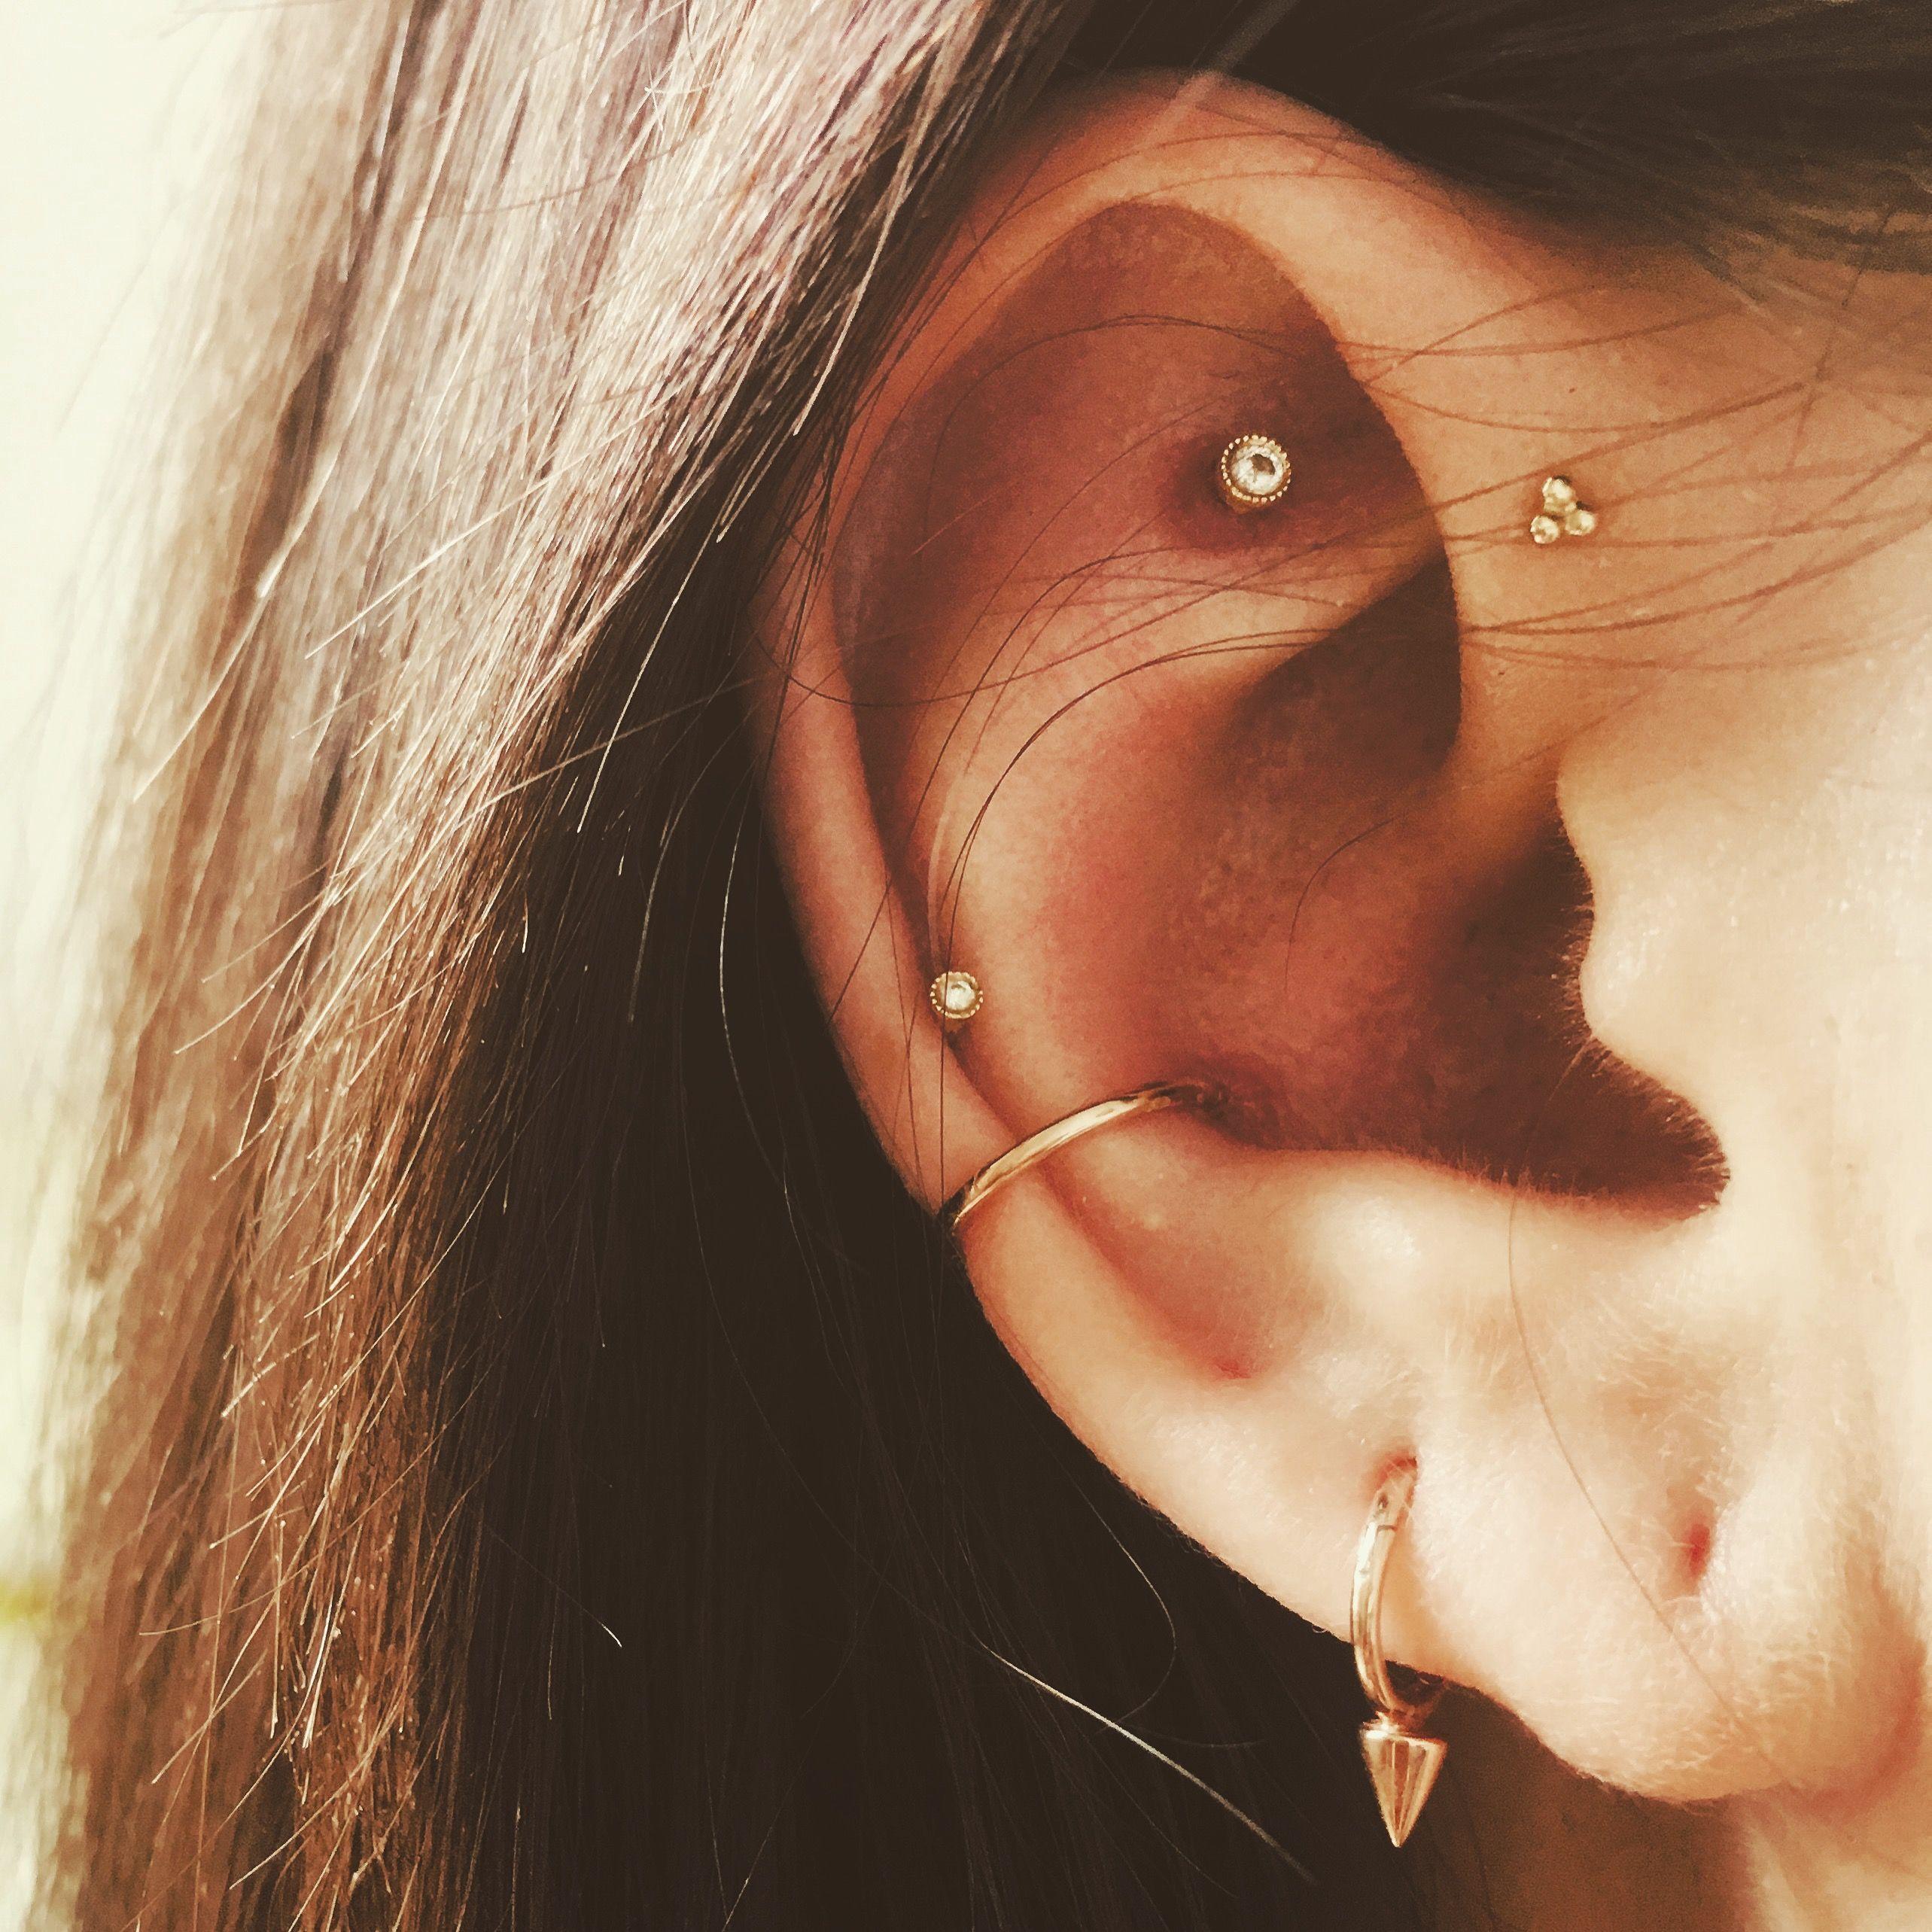 Orbital piercing ideas  Conch forward helix and Tash Rook piercings mariatashlondon